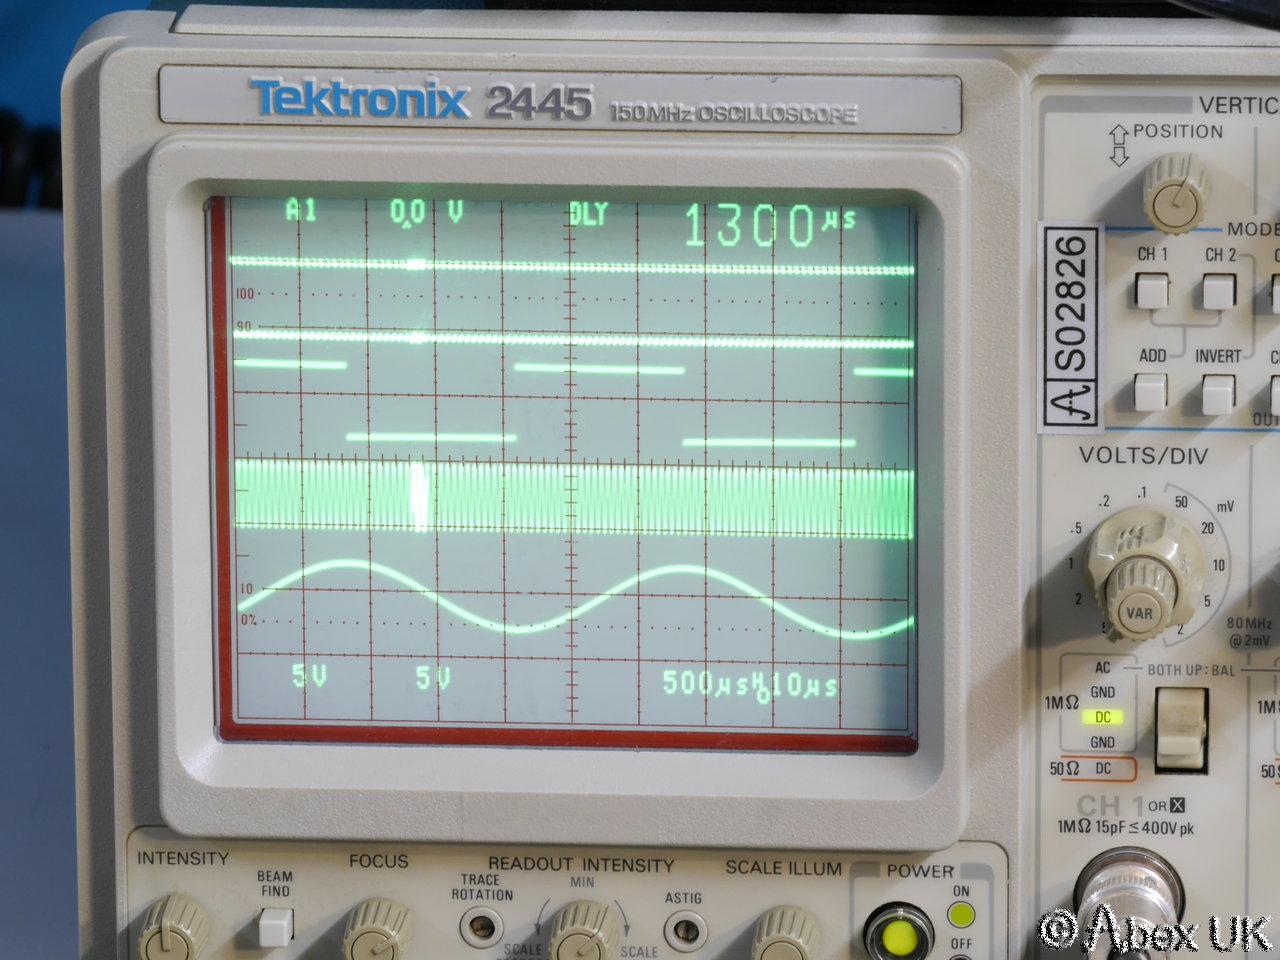 how to open tektronix oscilloscope